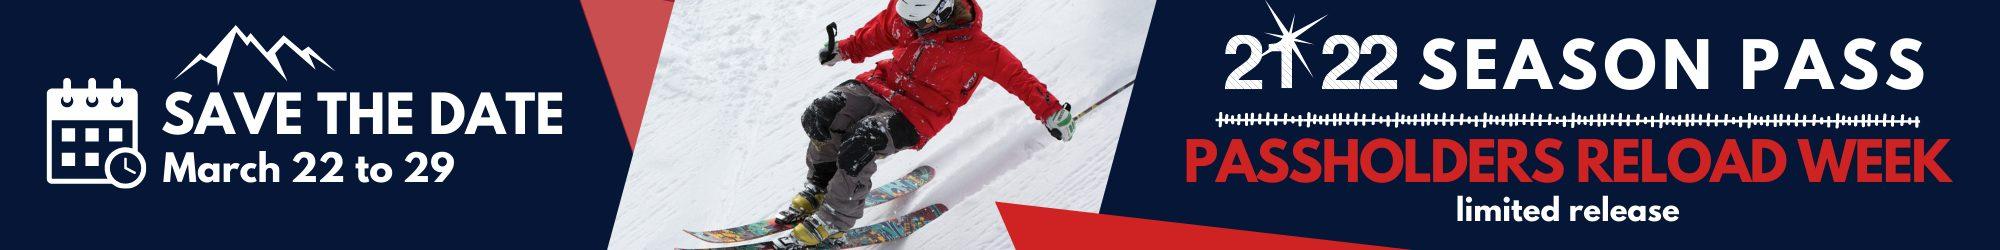 Winter Season Pass 2021 2022 PASS HOLDERS save the date